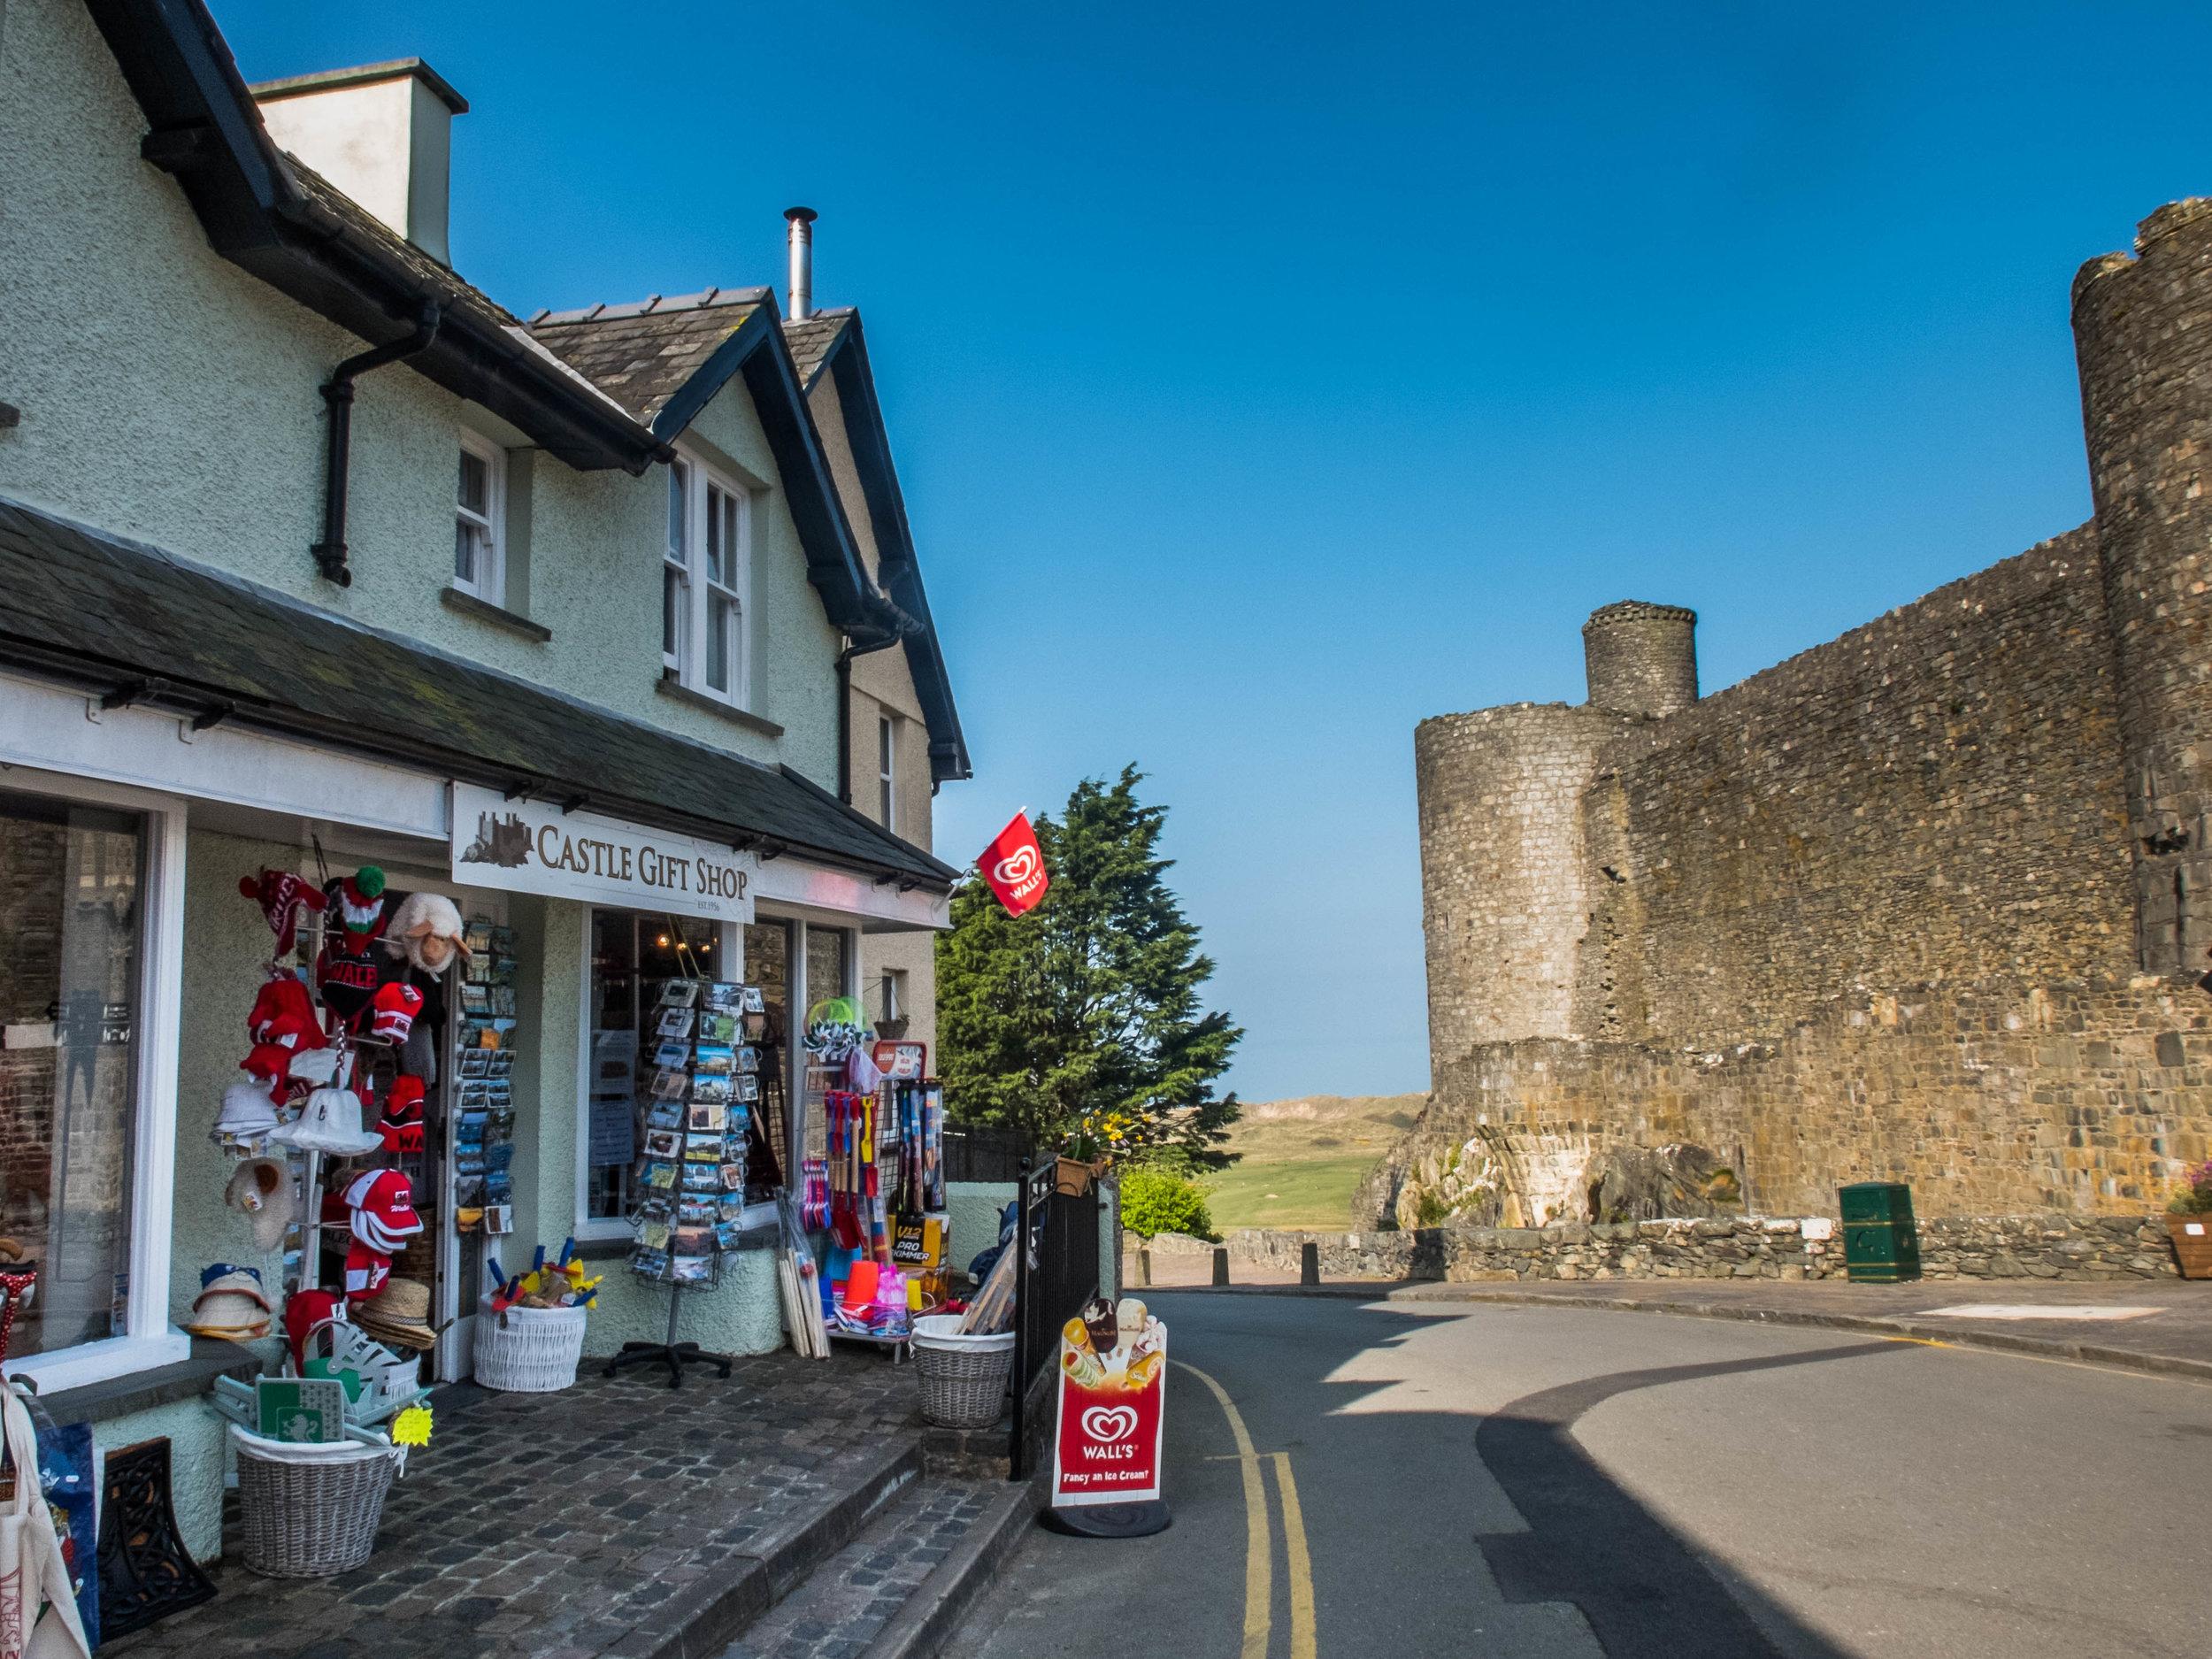 Harlech castle gift shop